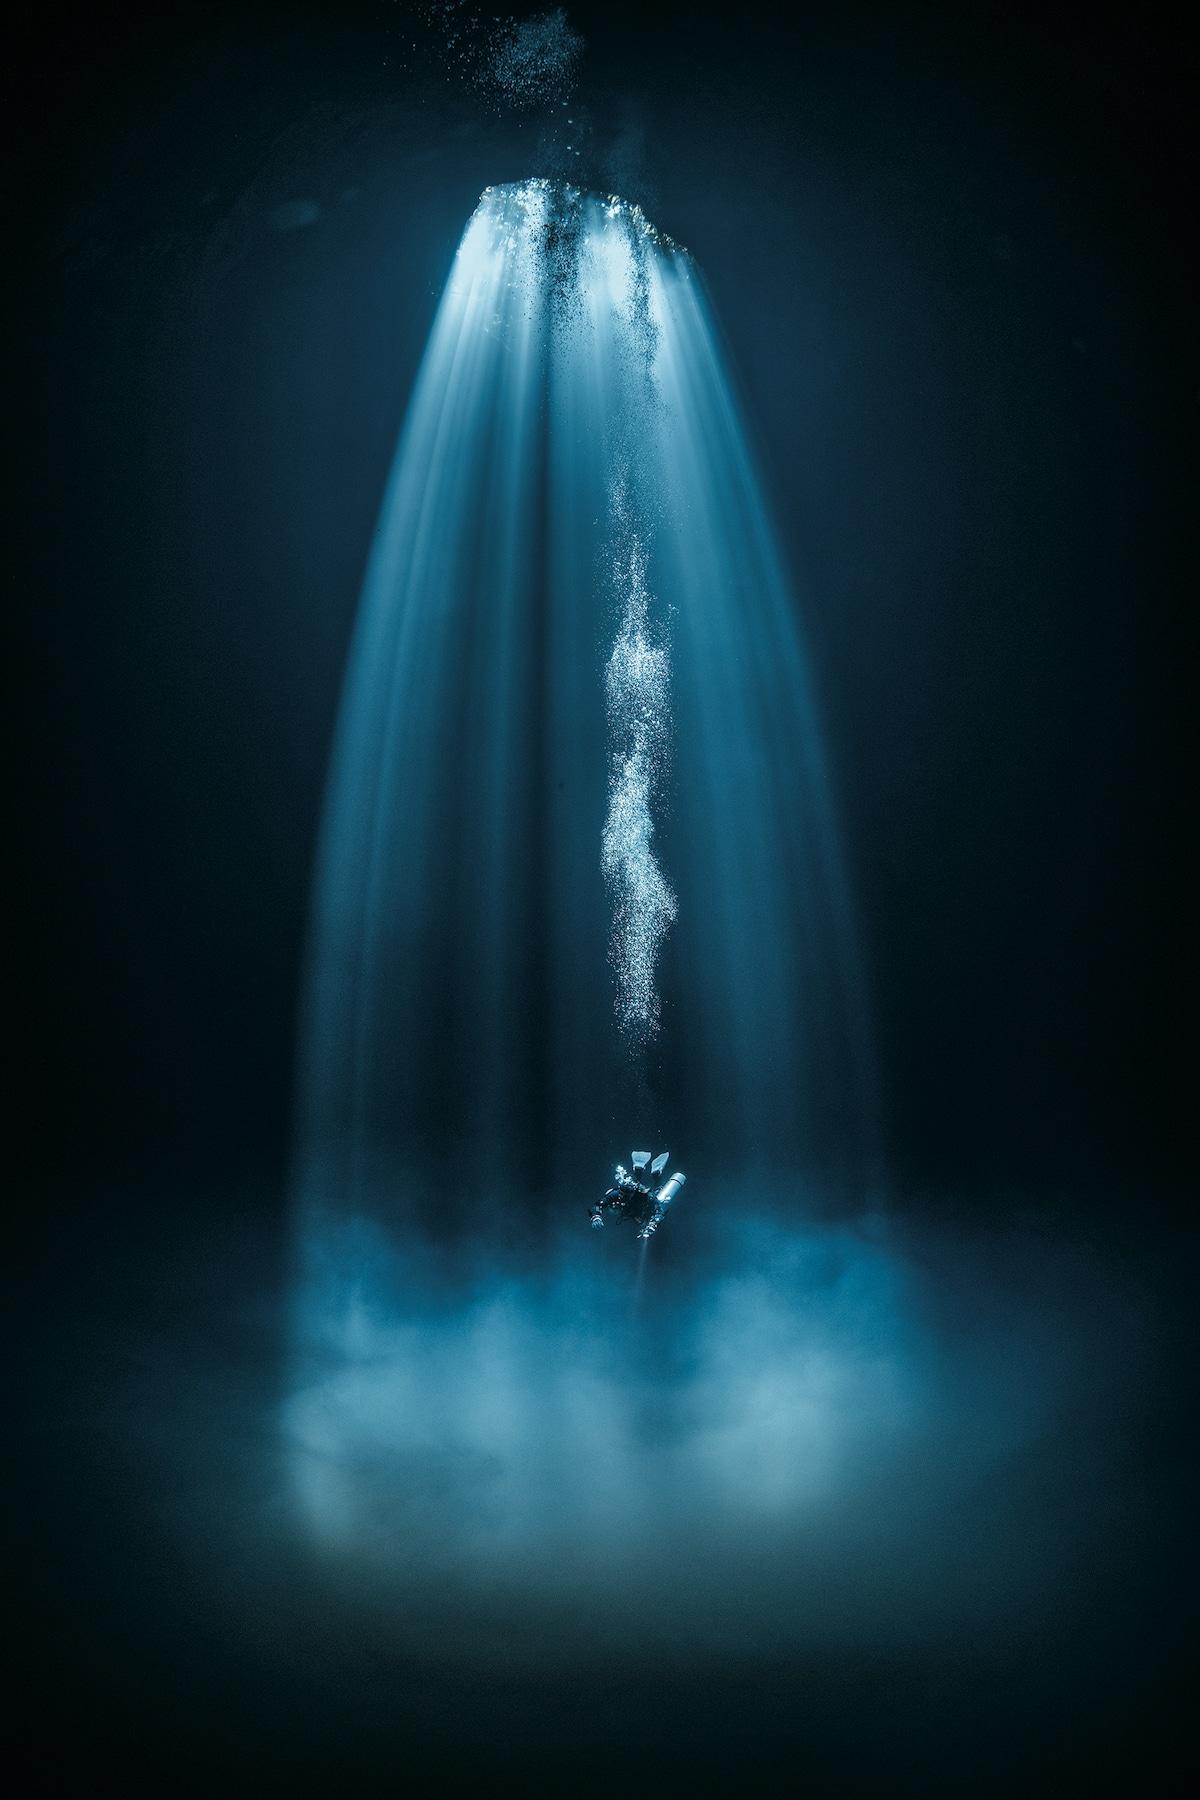 Scuba Diving Magazine Contest Martin Strmiska 1st WideAngle